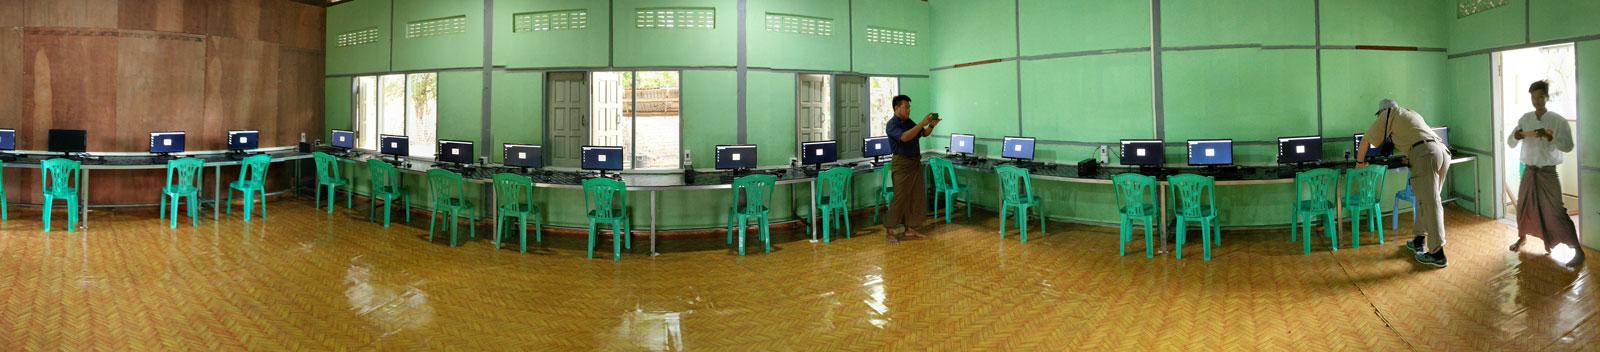 Homepage - Building 100 Schools in Burma